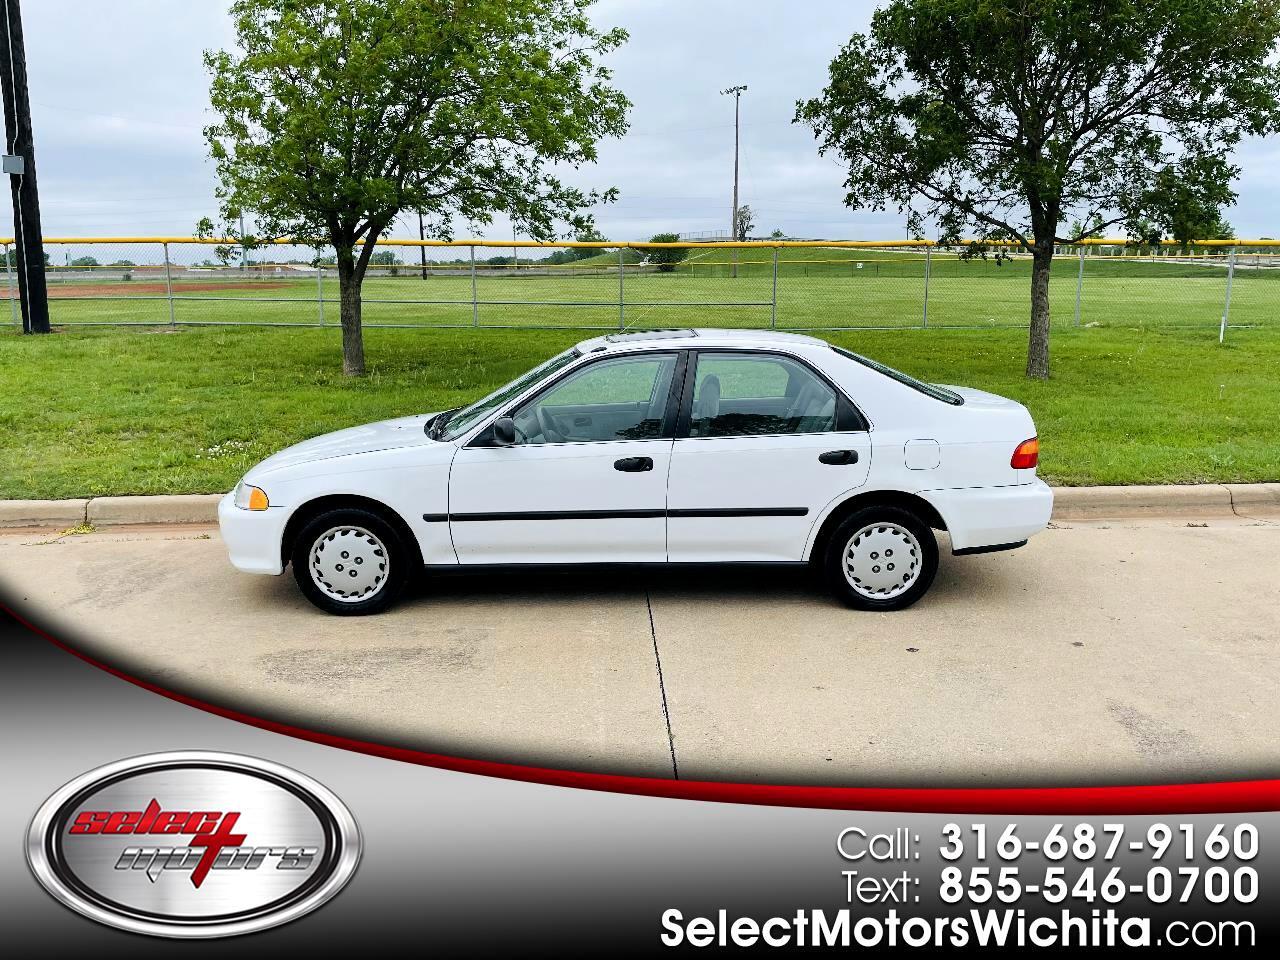 Honda Civic 4dr Sedan LX Auto 1.5L 1995